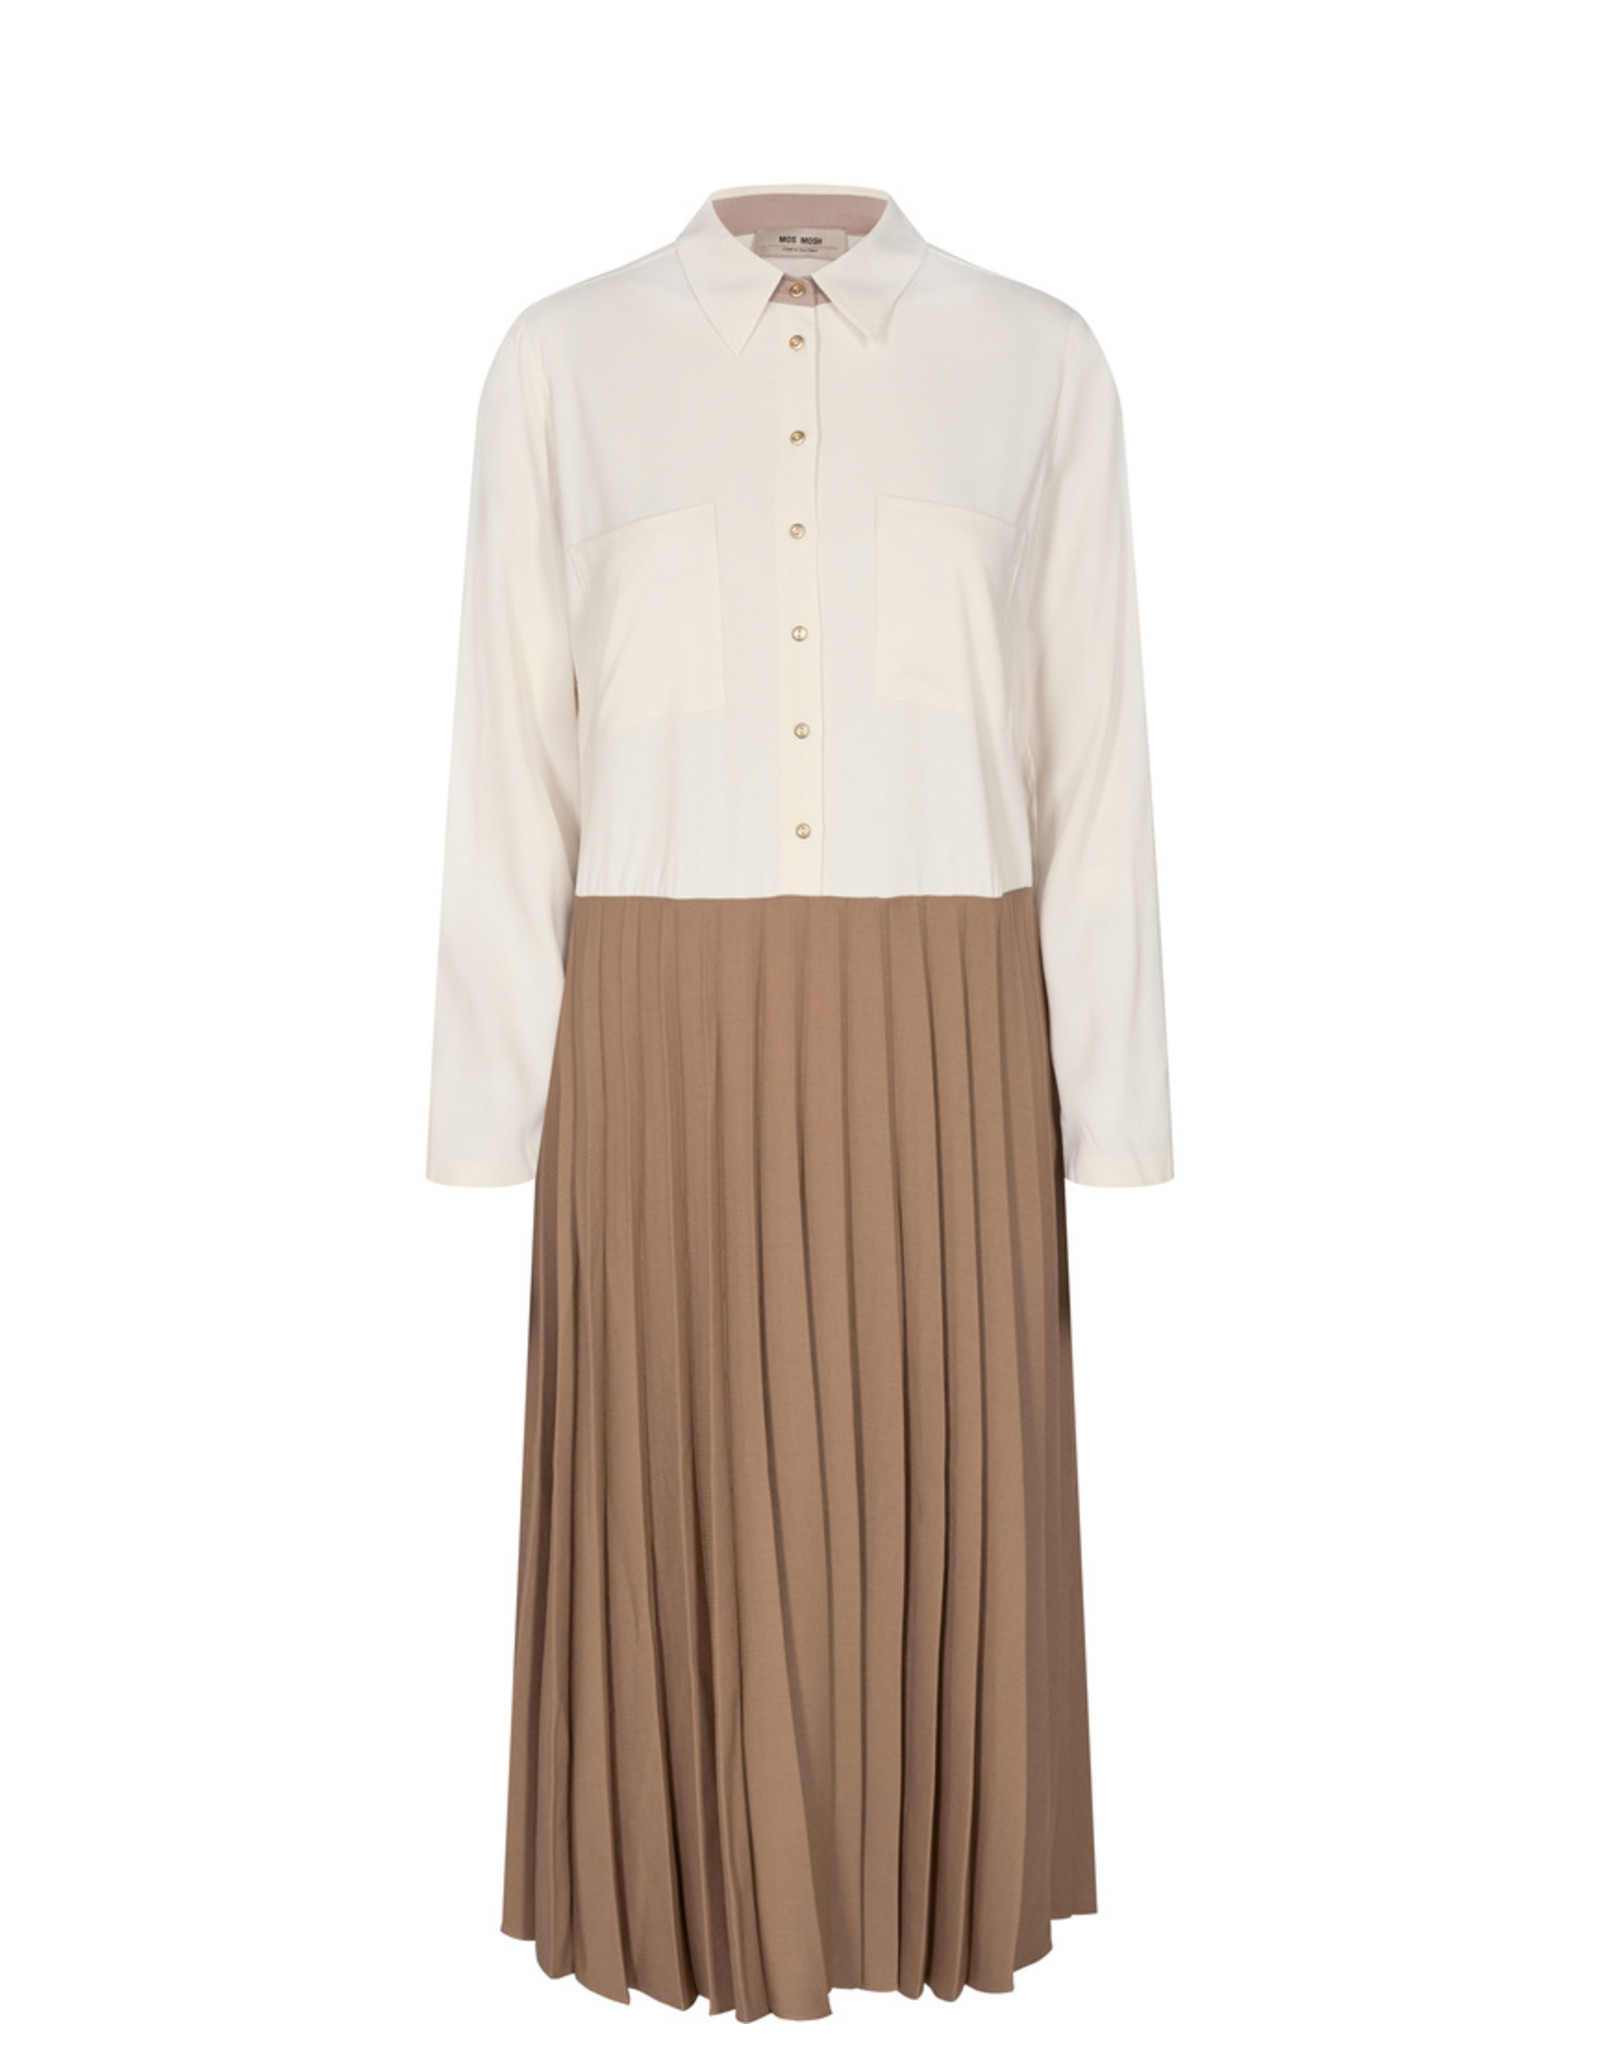 Mos Mosh Fawn Cassie Dress